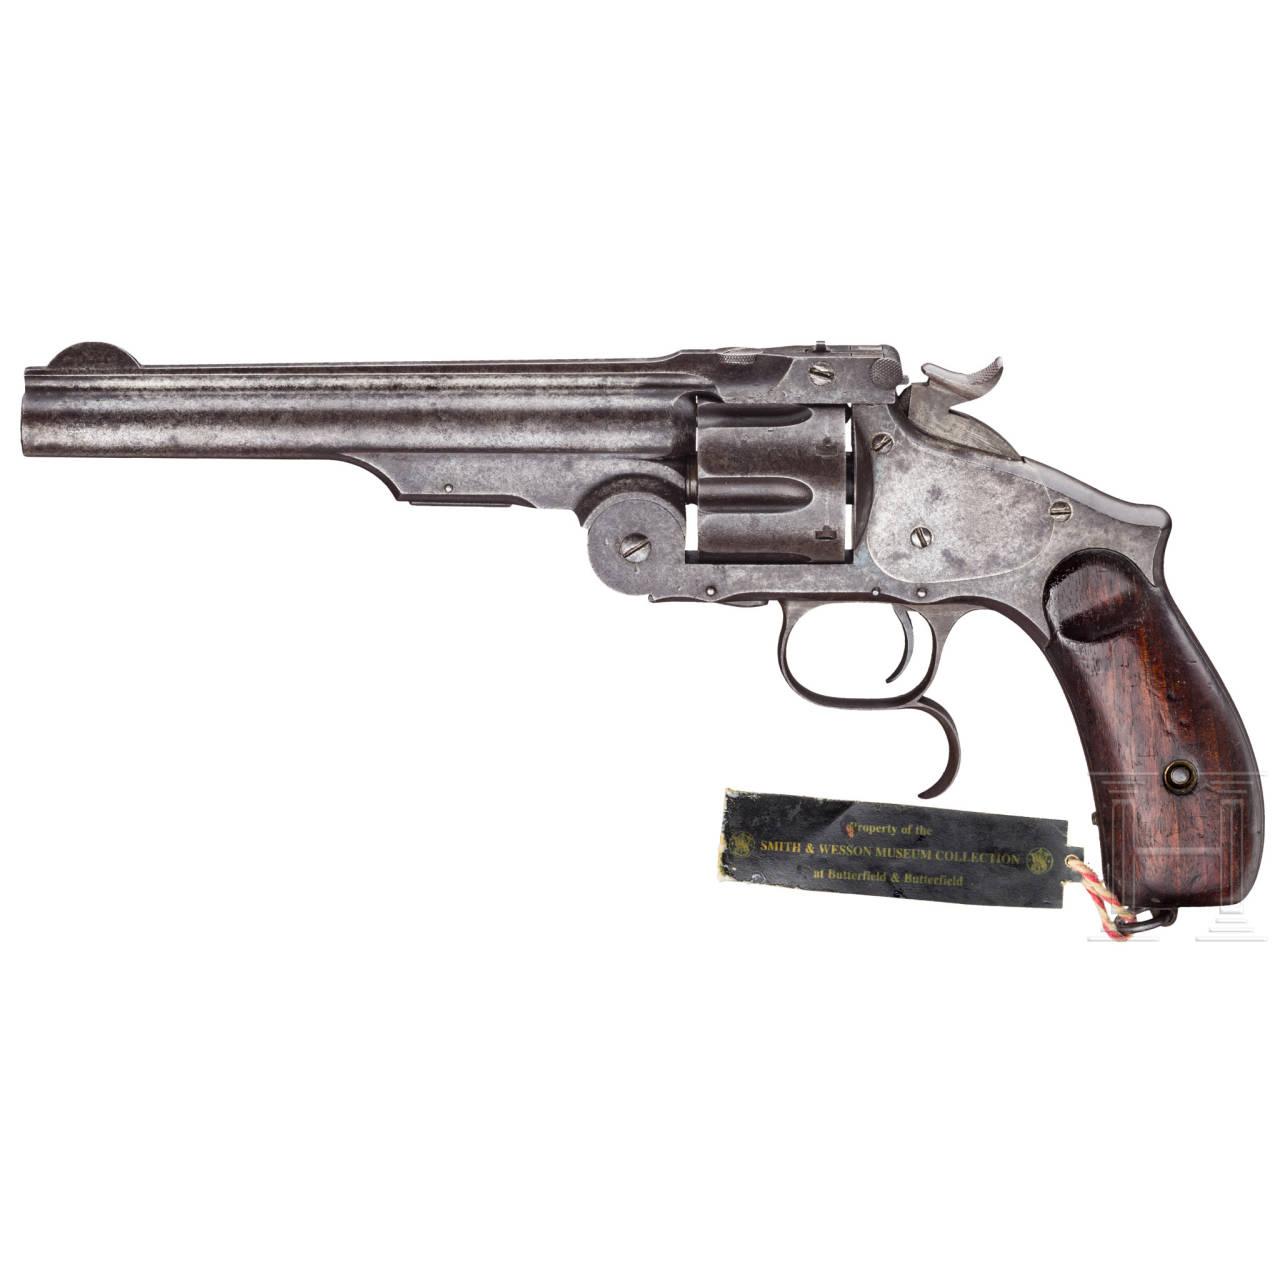 Smith & Wesson New Model No. 3, Ludwig Loewe, Berlin